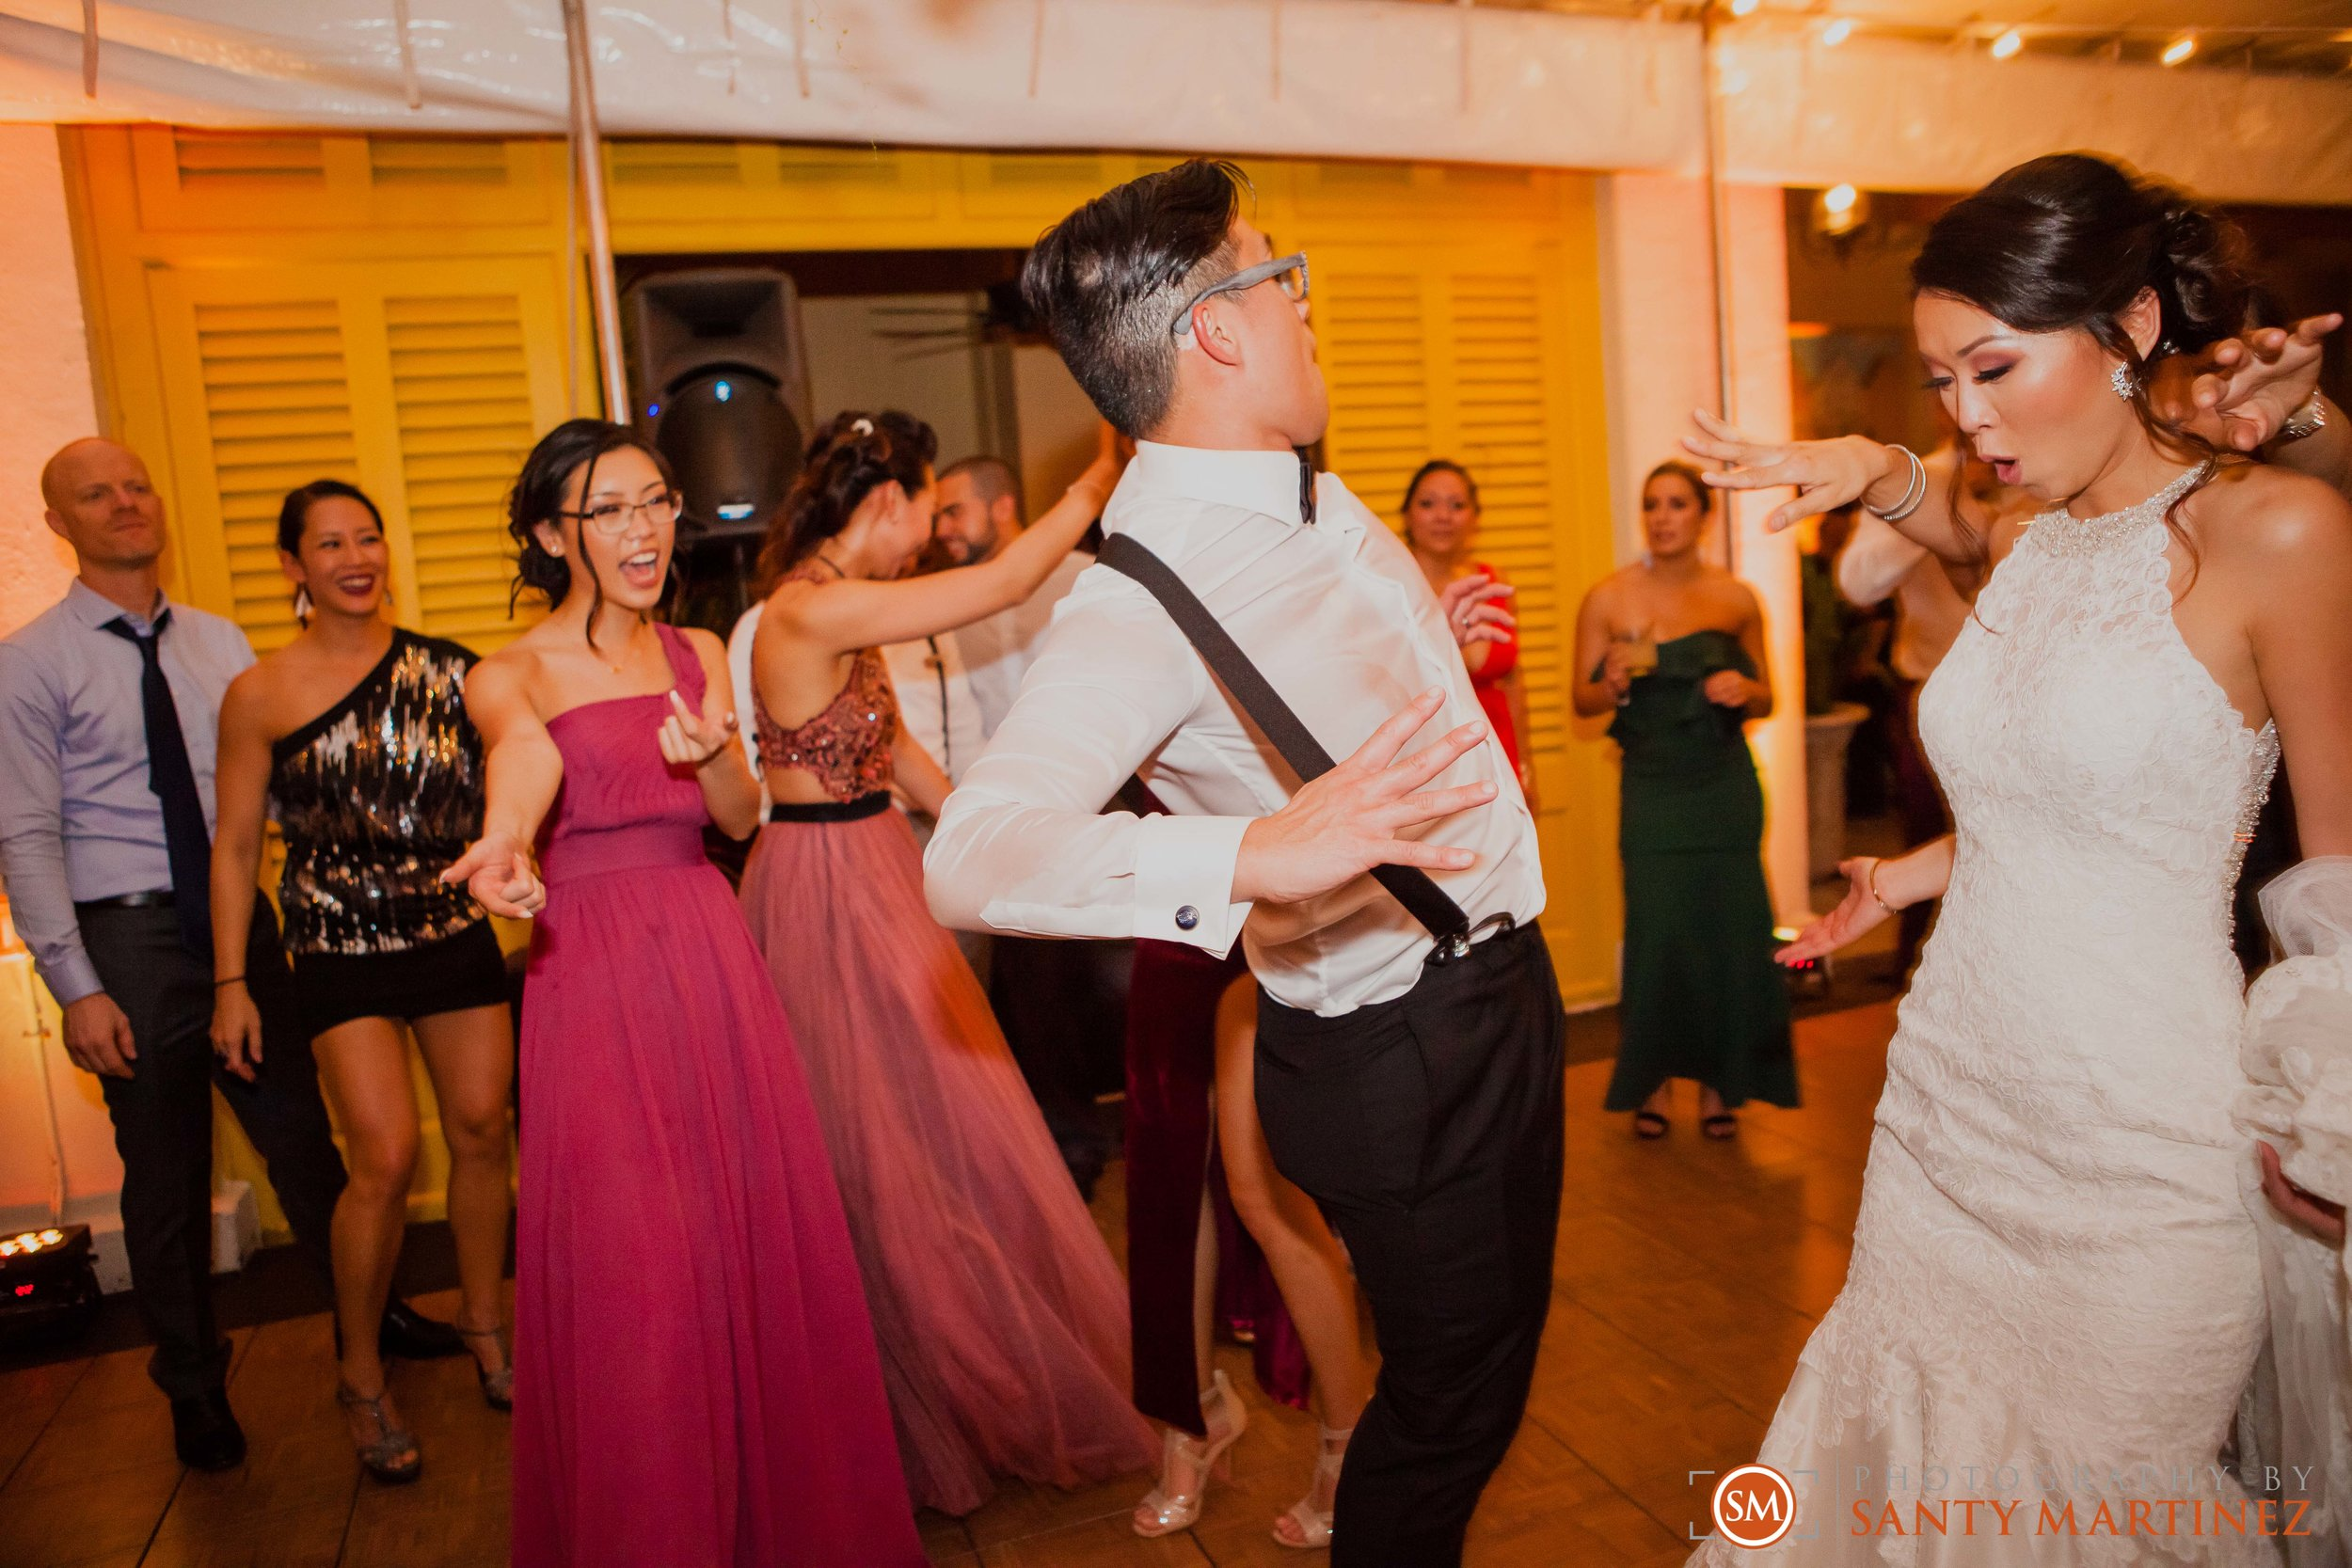 Wedding Bonnet House - Photography by Santy Martinez-48.jpg